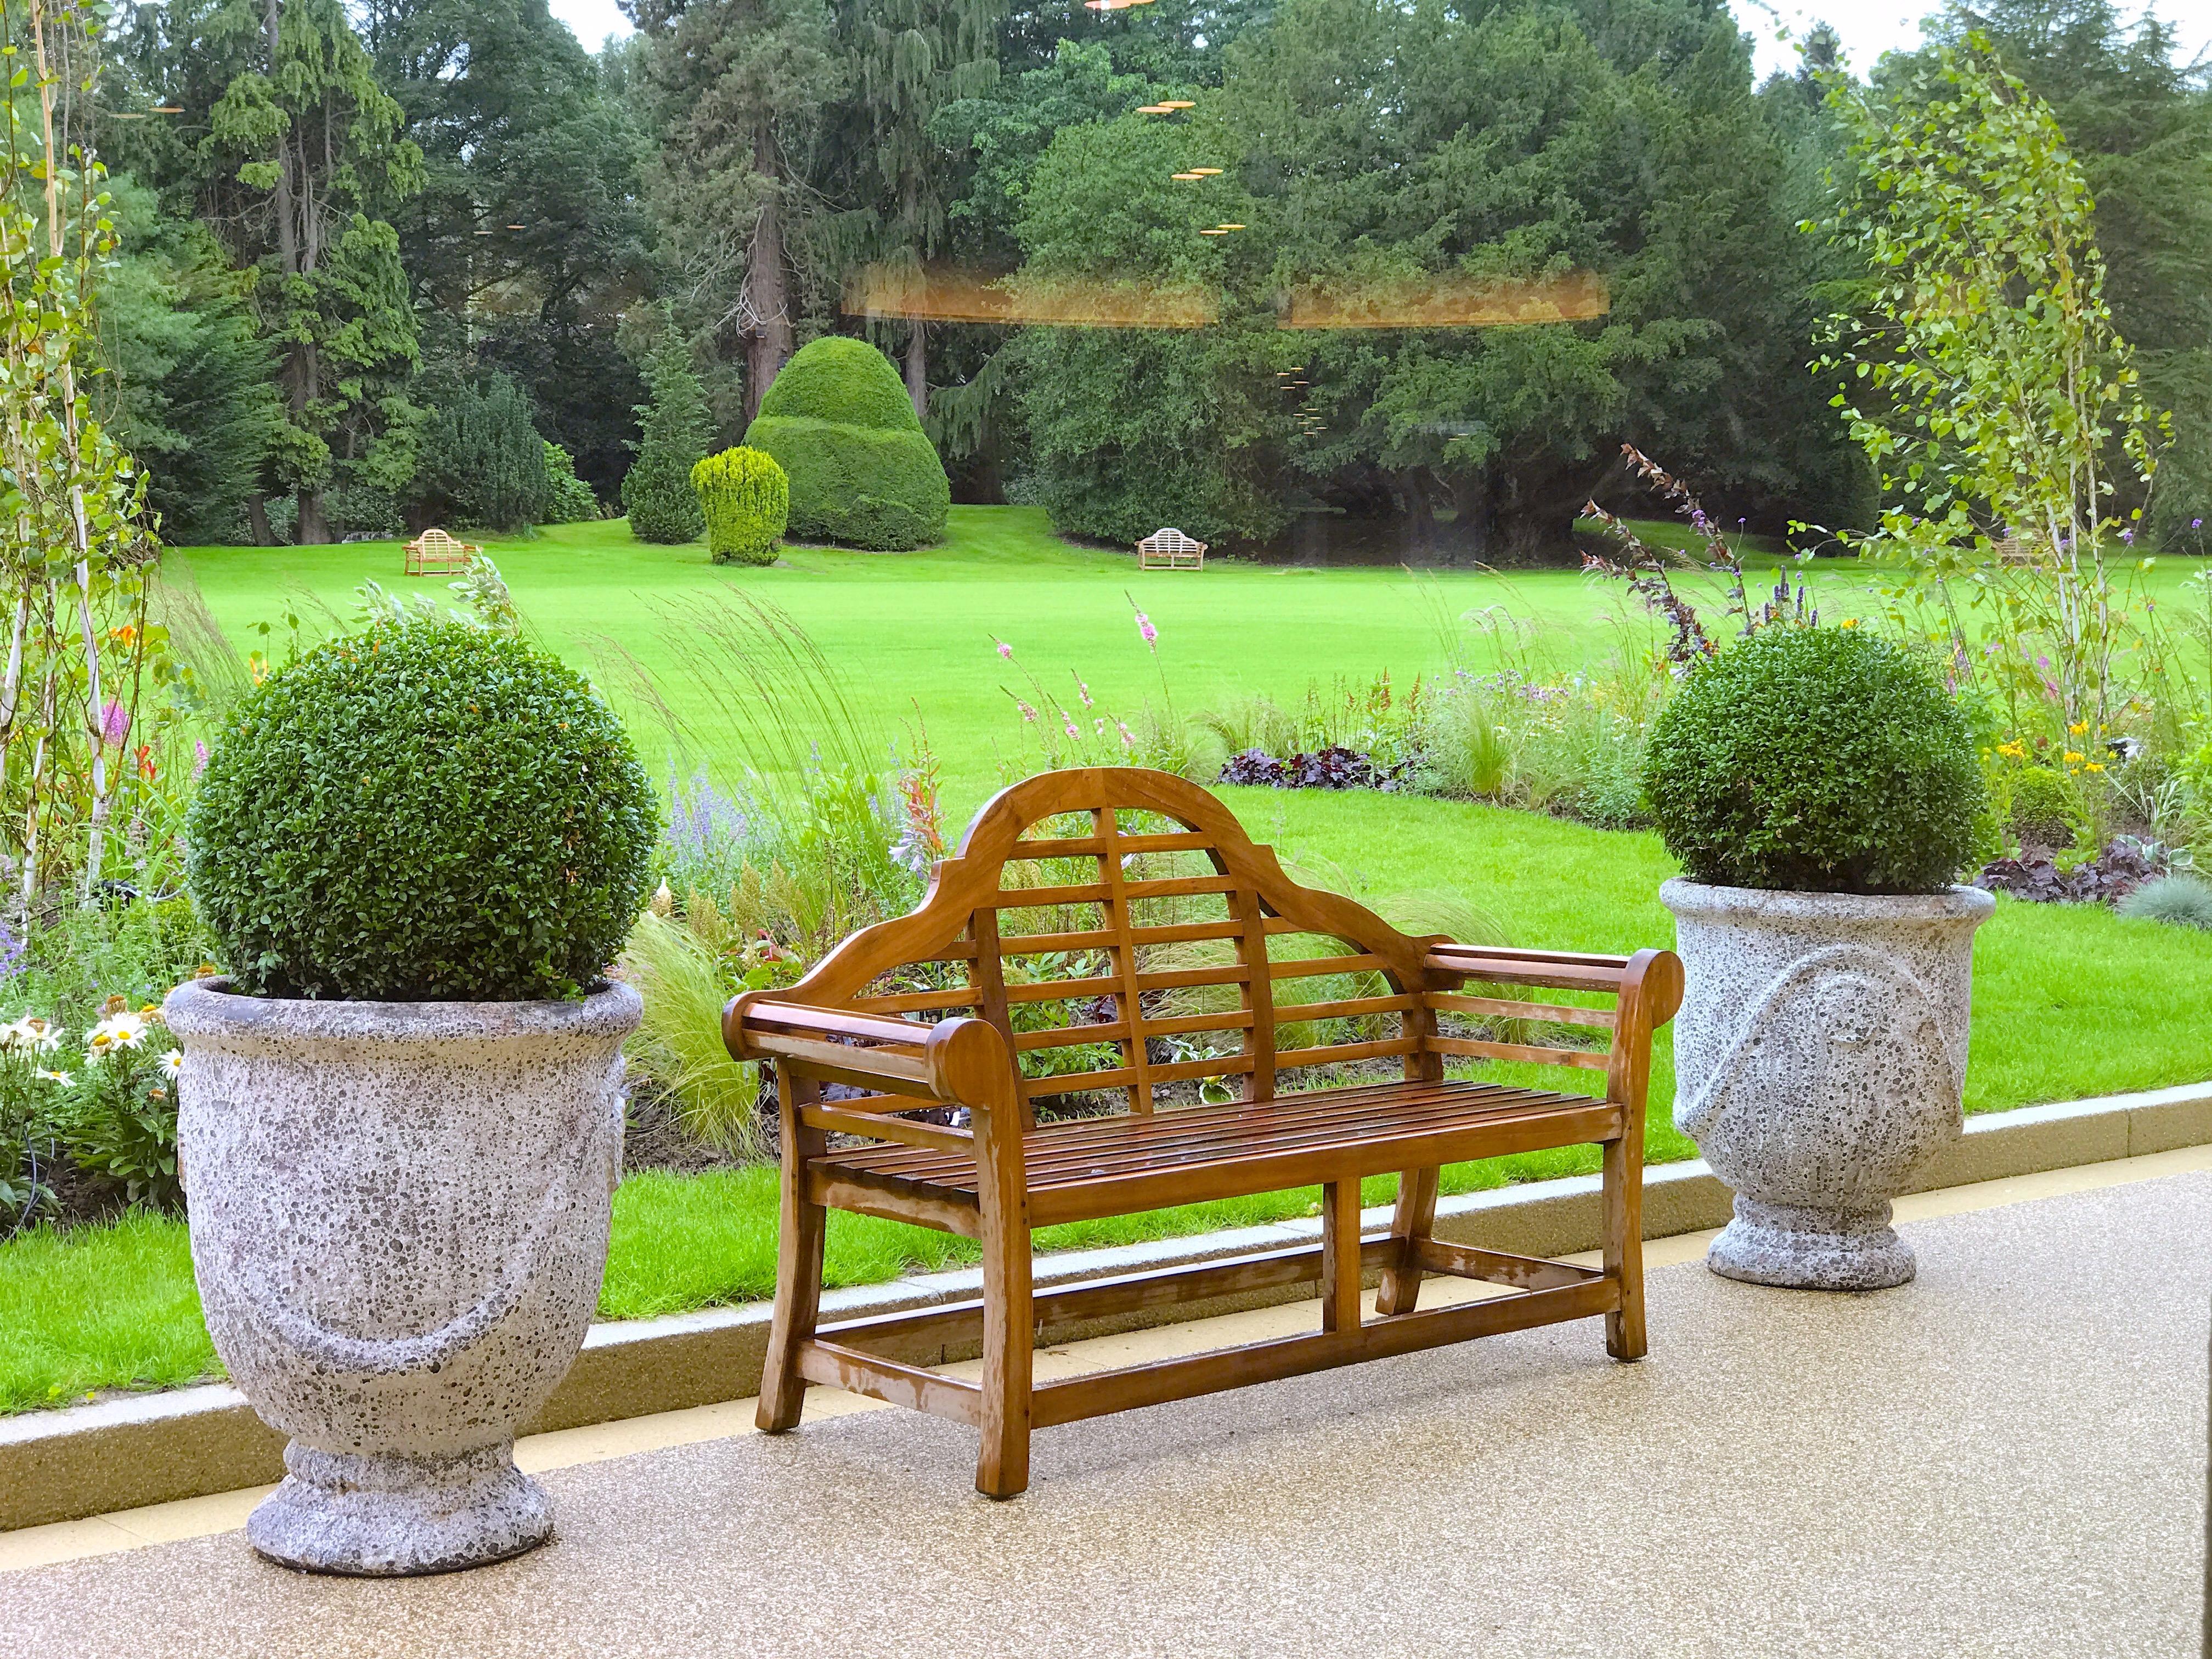 Grantley Hall, Harrogate, Accommodation, luxury travel, hotel